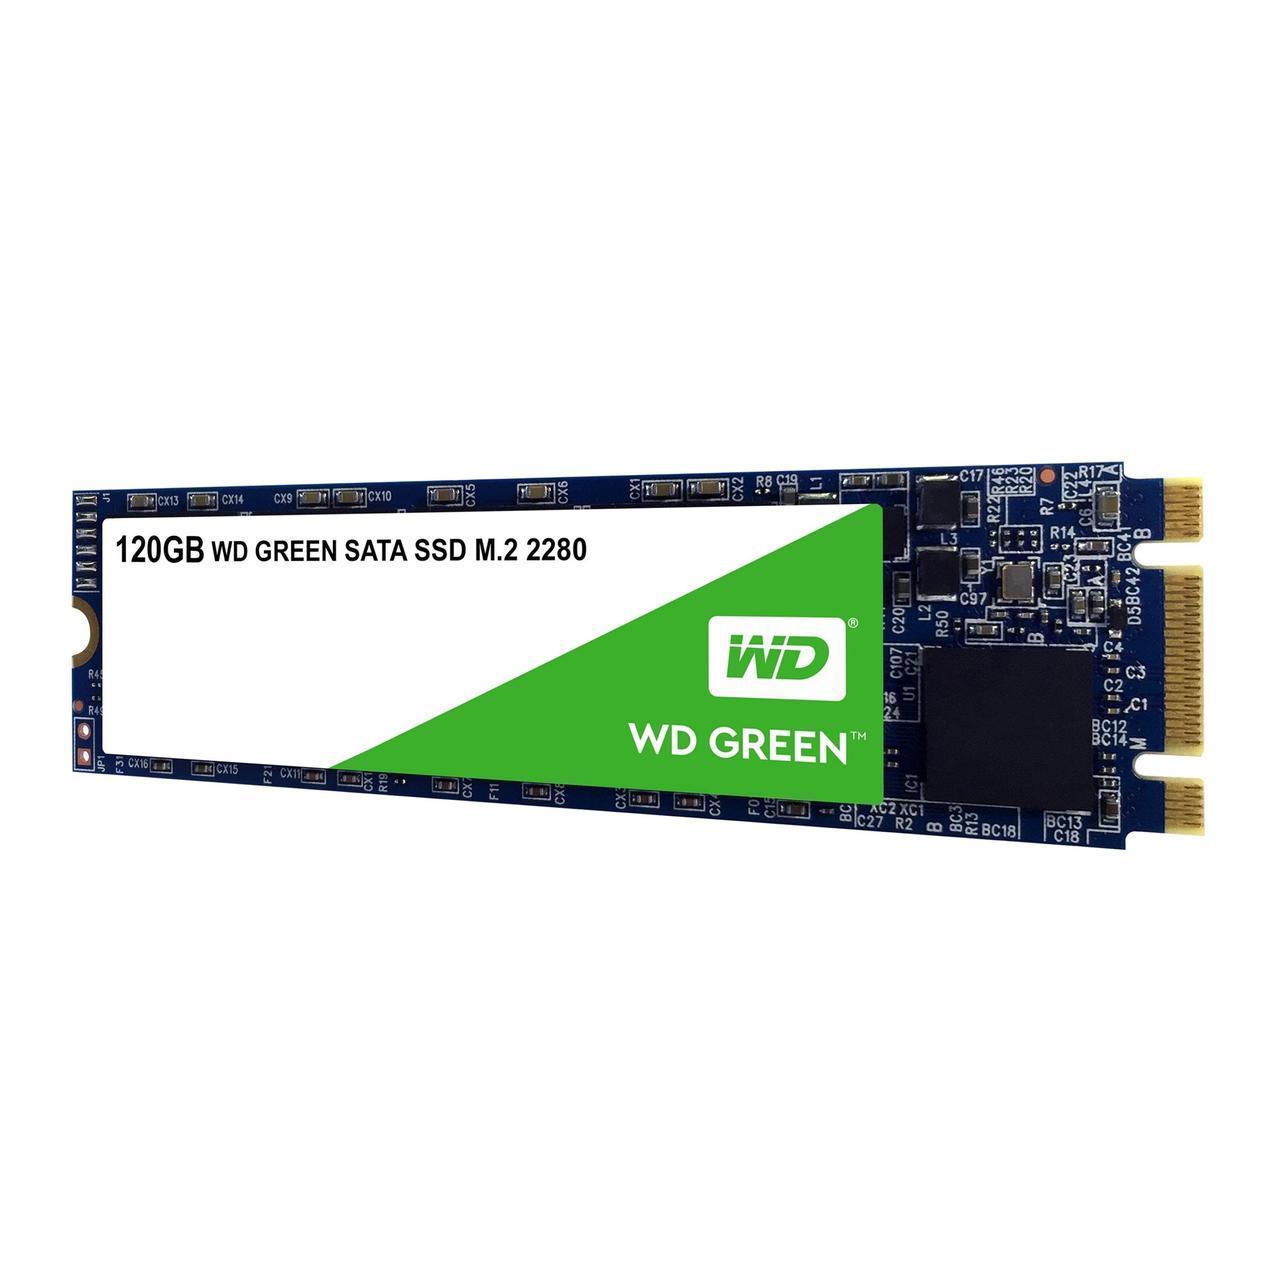 Western Digital WDS120G2G0B Твердотельный накопитель 120GB SSD M.2 2280 R545Mb/s SATA